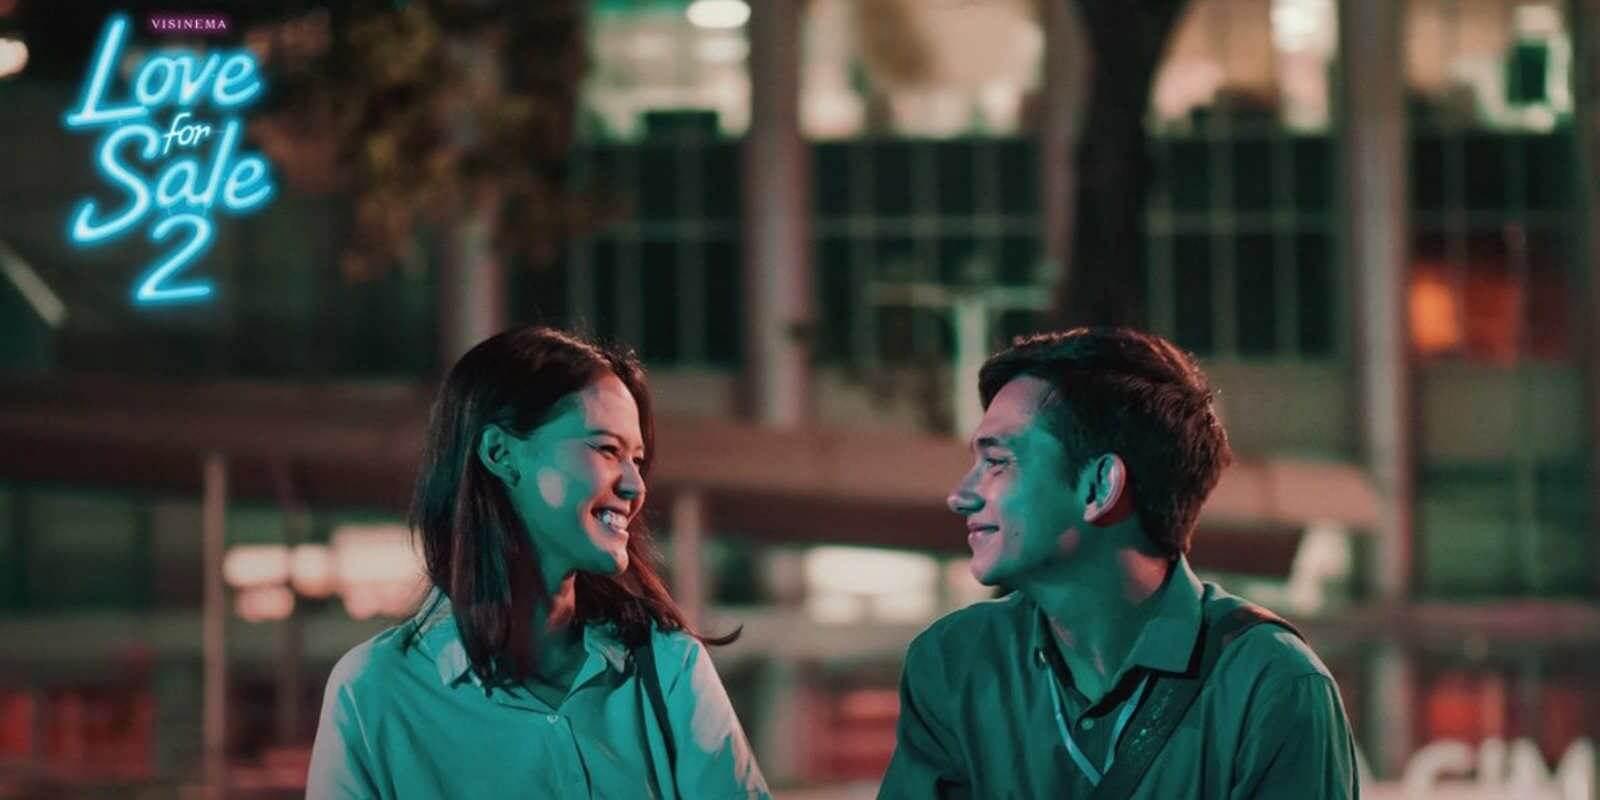 Love for Sale 2 - Netflix Dirangkul Mas Nadiem, Nonton Lagi Film Romantis Terbaik 2019 Yuk